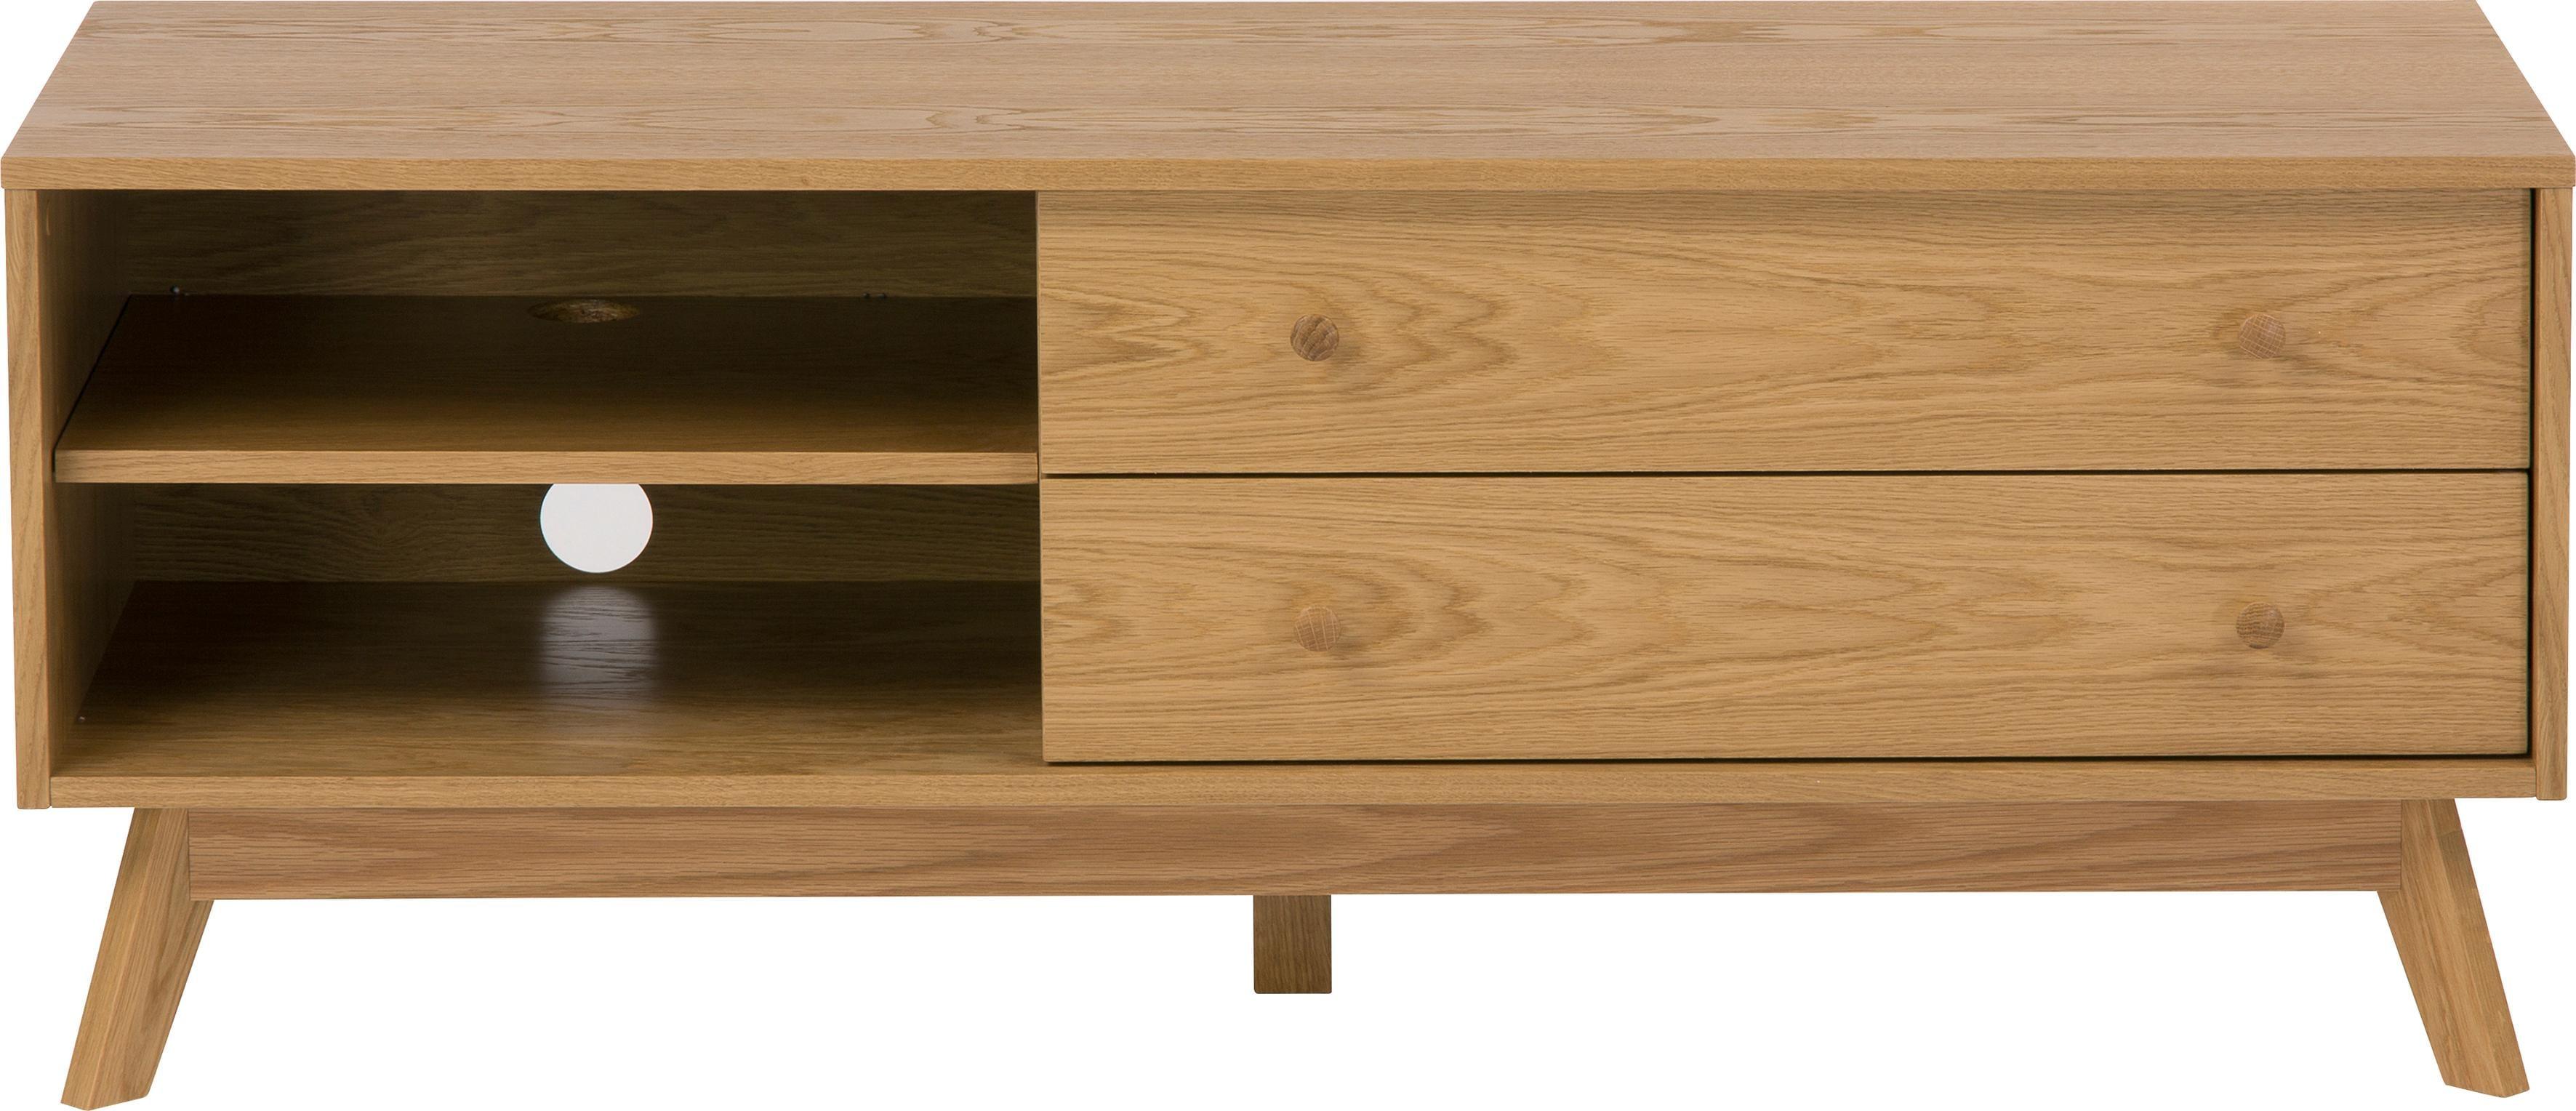 Wundervoll Woodman Möbel Referenz Von Tv-lowboard »bjórgvinÂ«, Breite 130 Cm